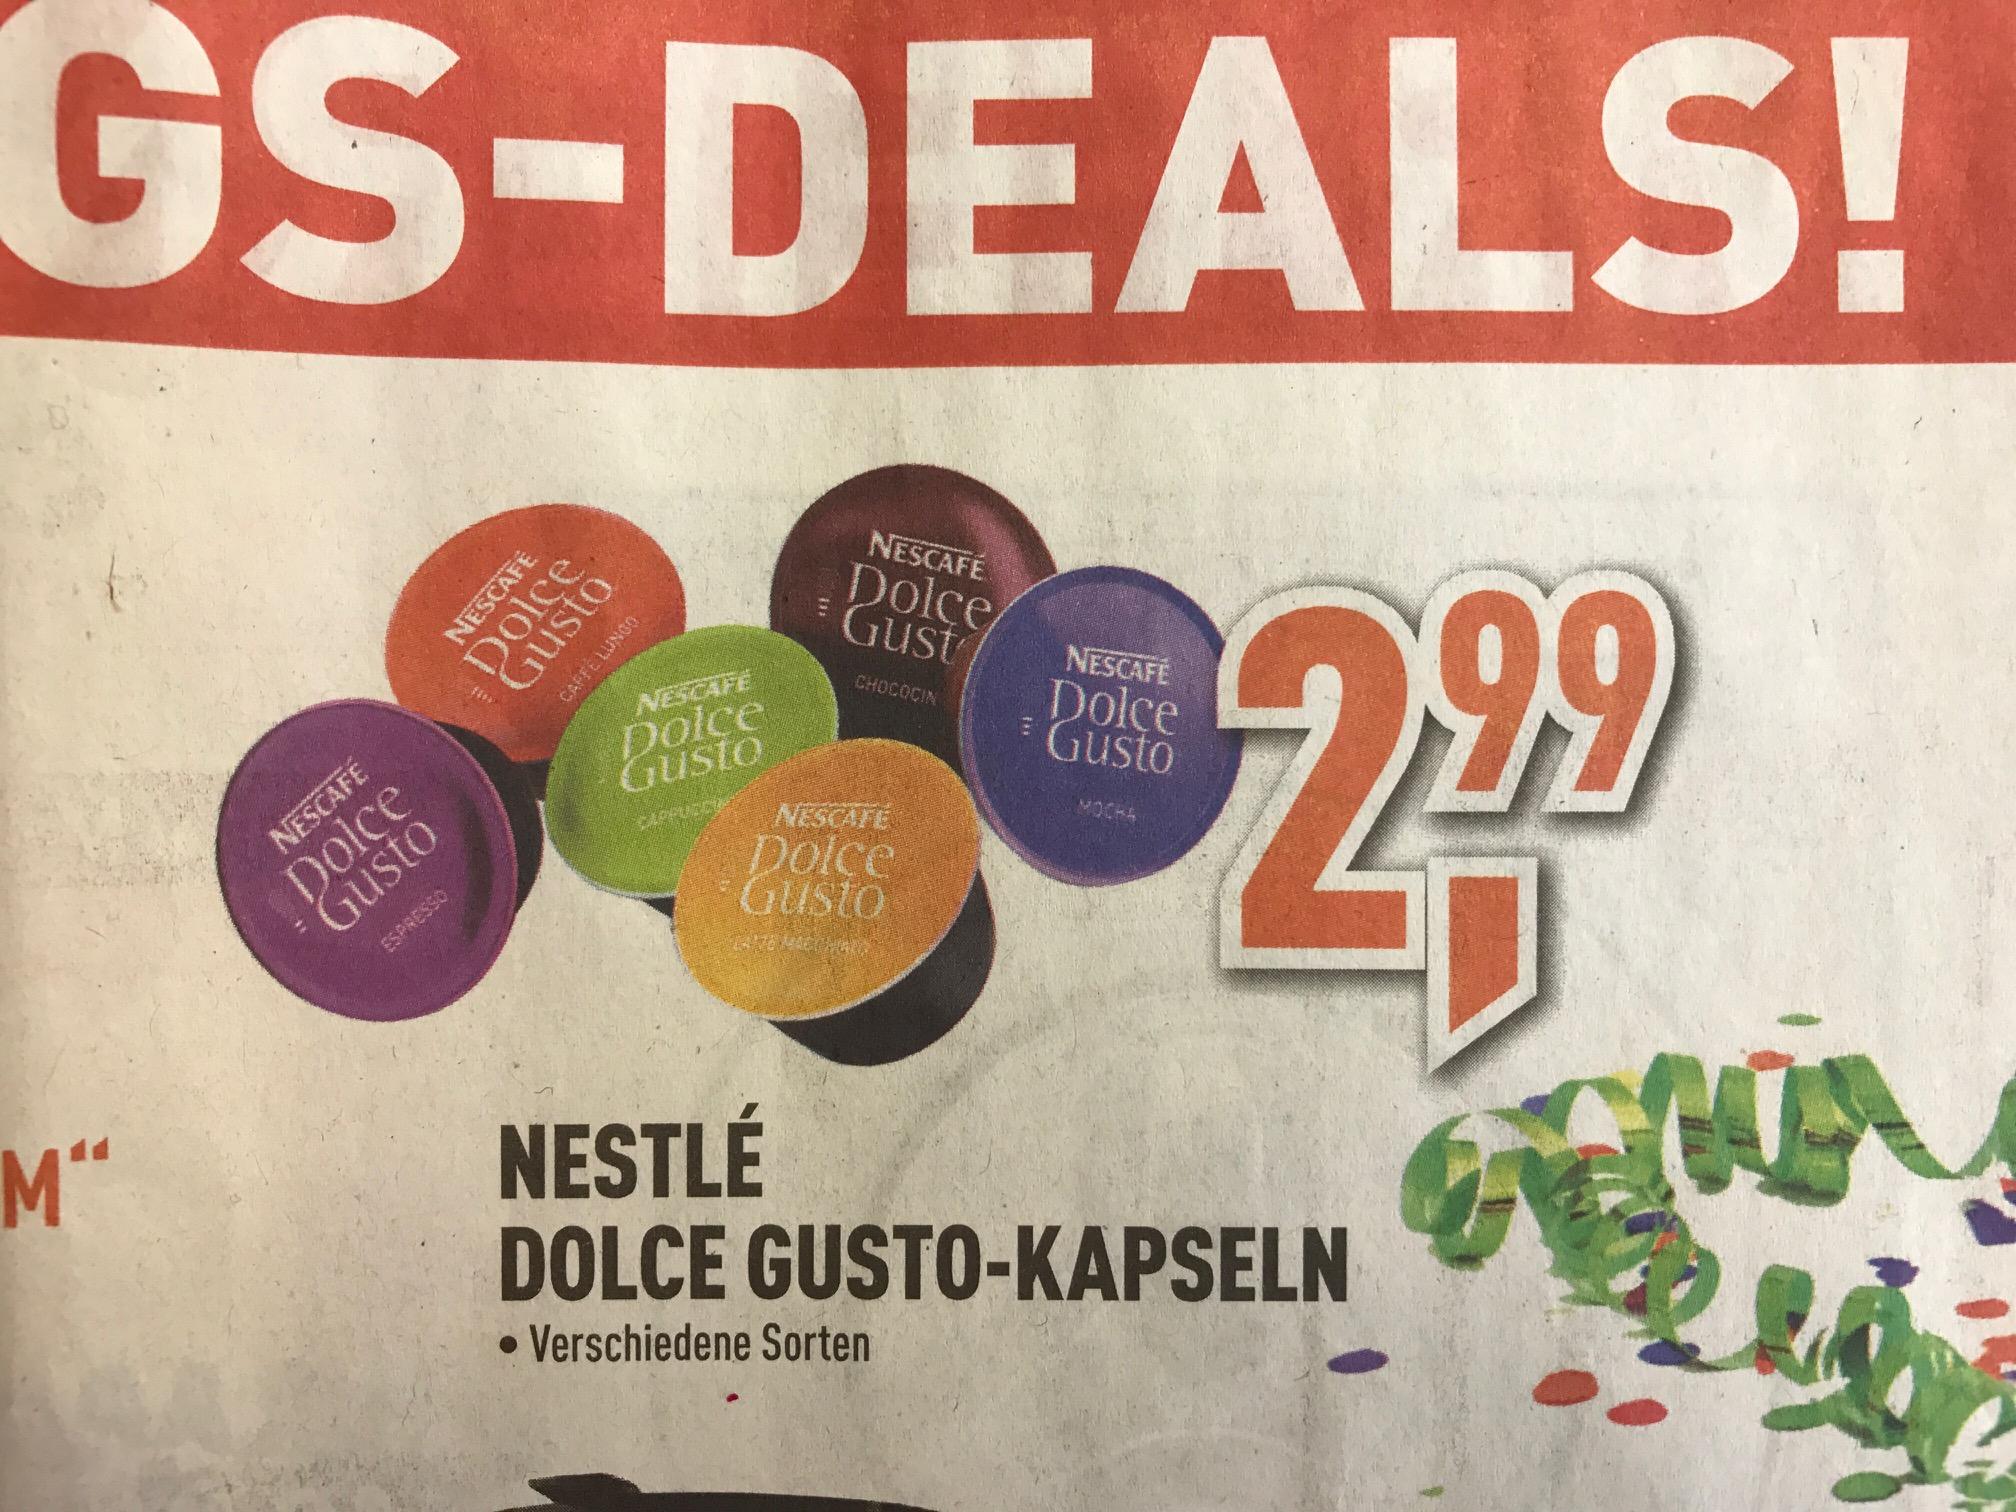 [LOKAL Berlet Hamm] Nestle Dolce Gusto Kapseln – verschiedene Sorten für 2,99 €